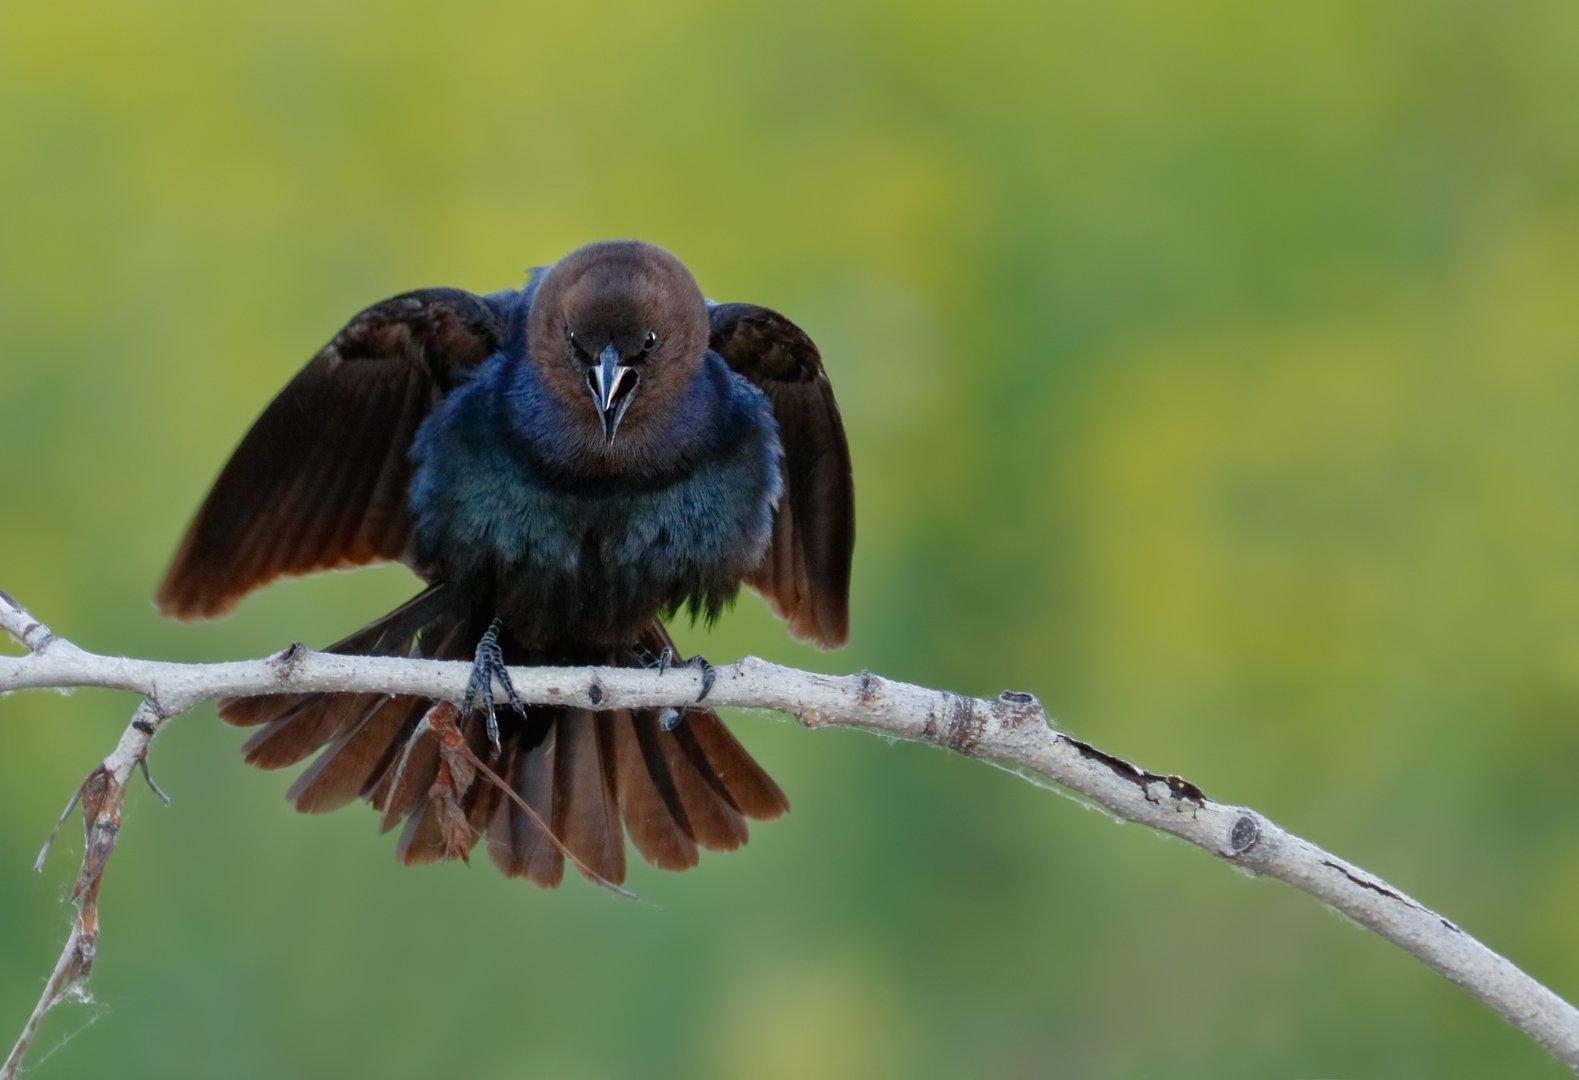 angry black bird